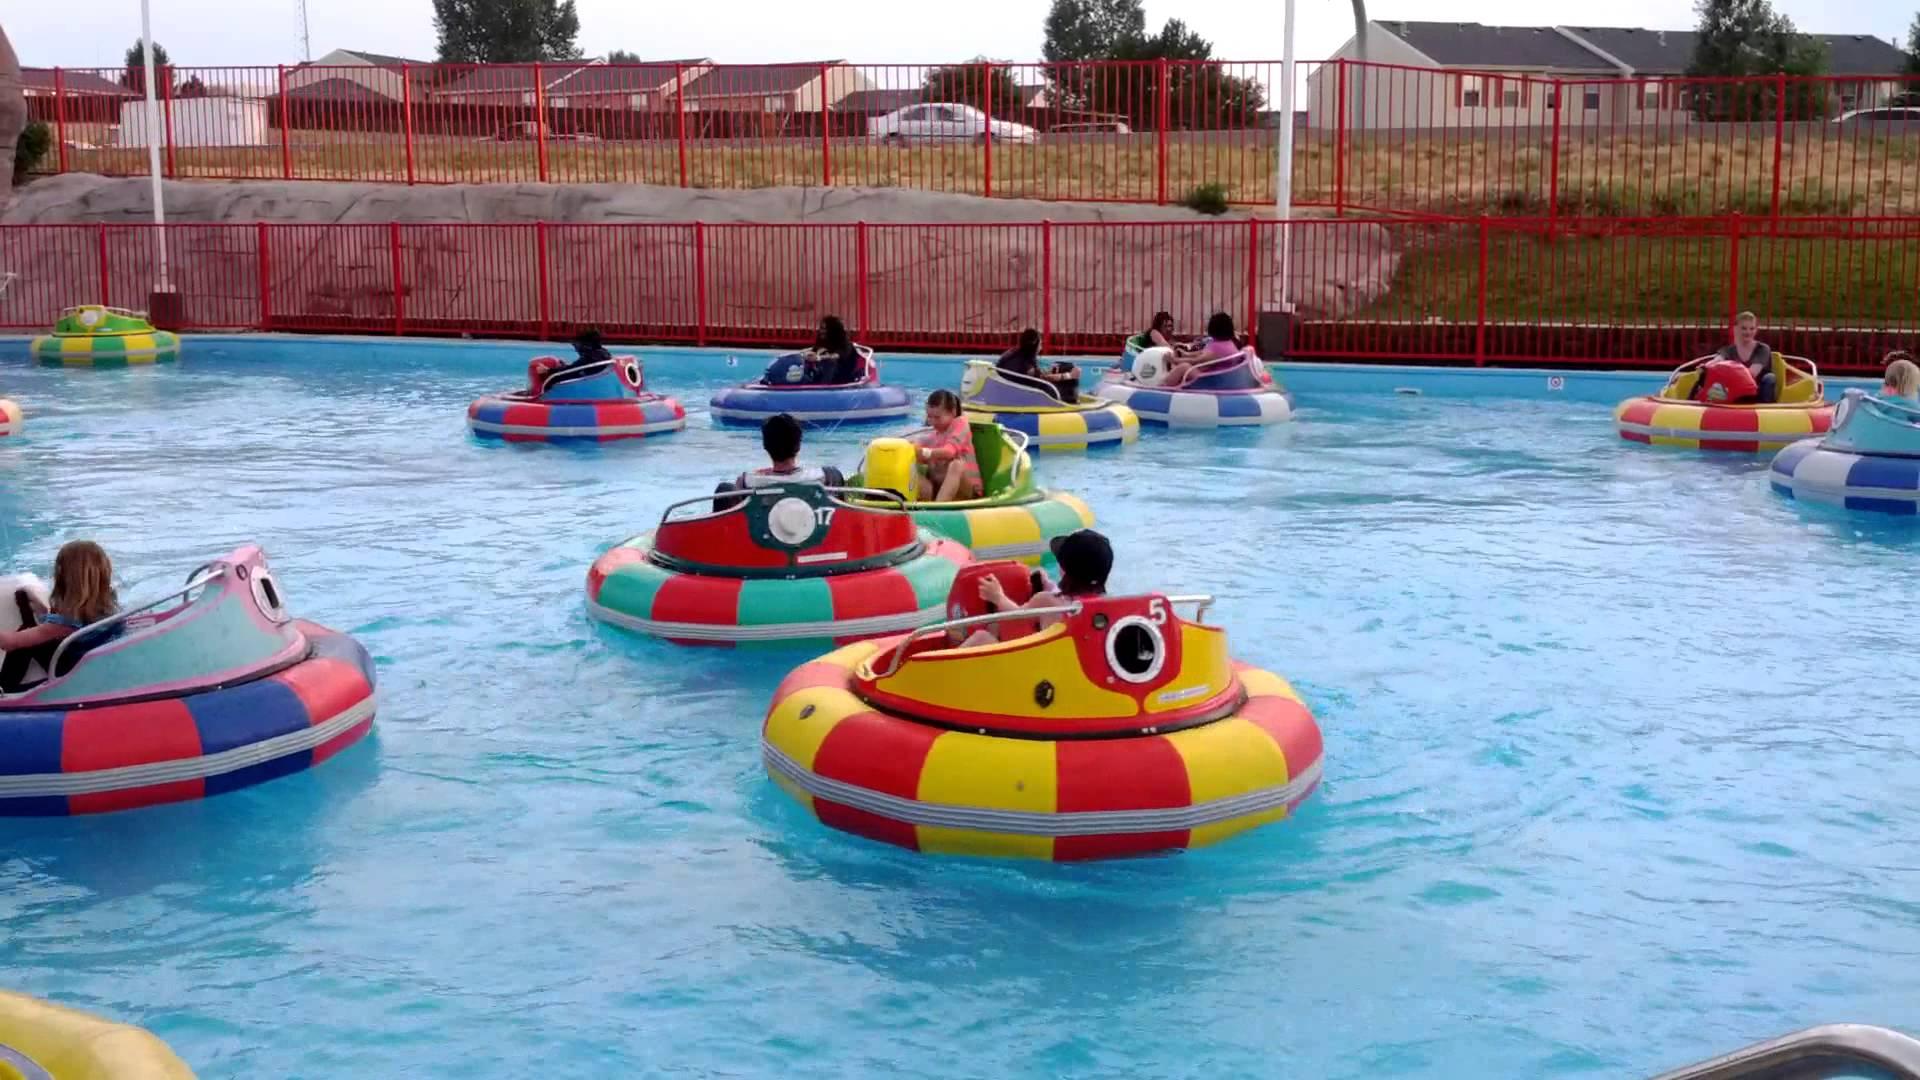 kids Riding Bumper Boats